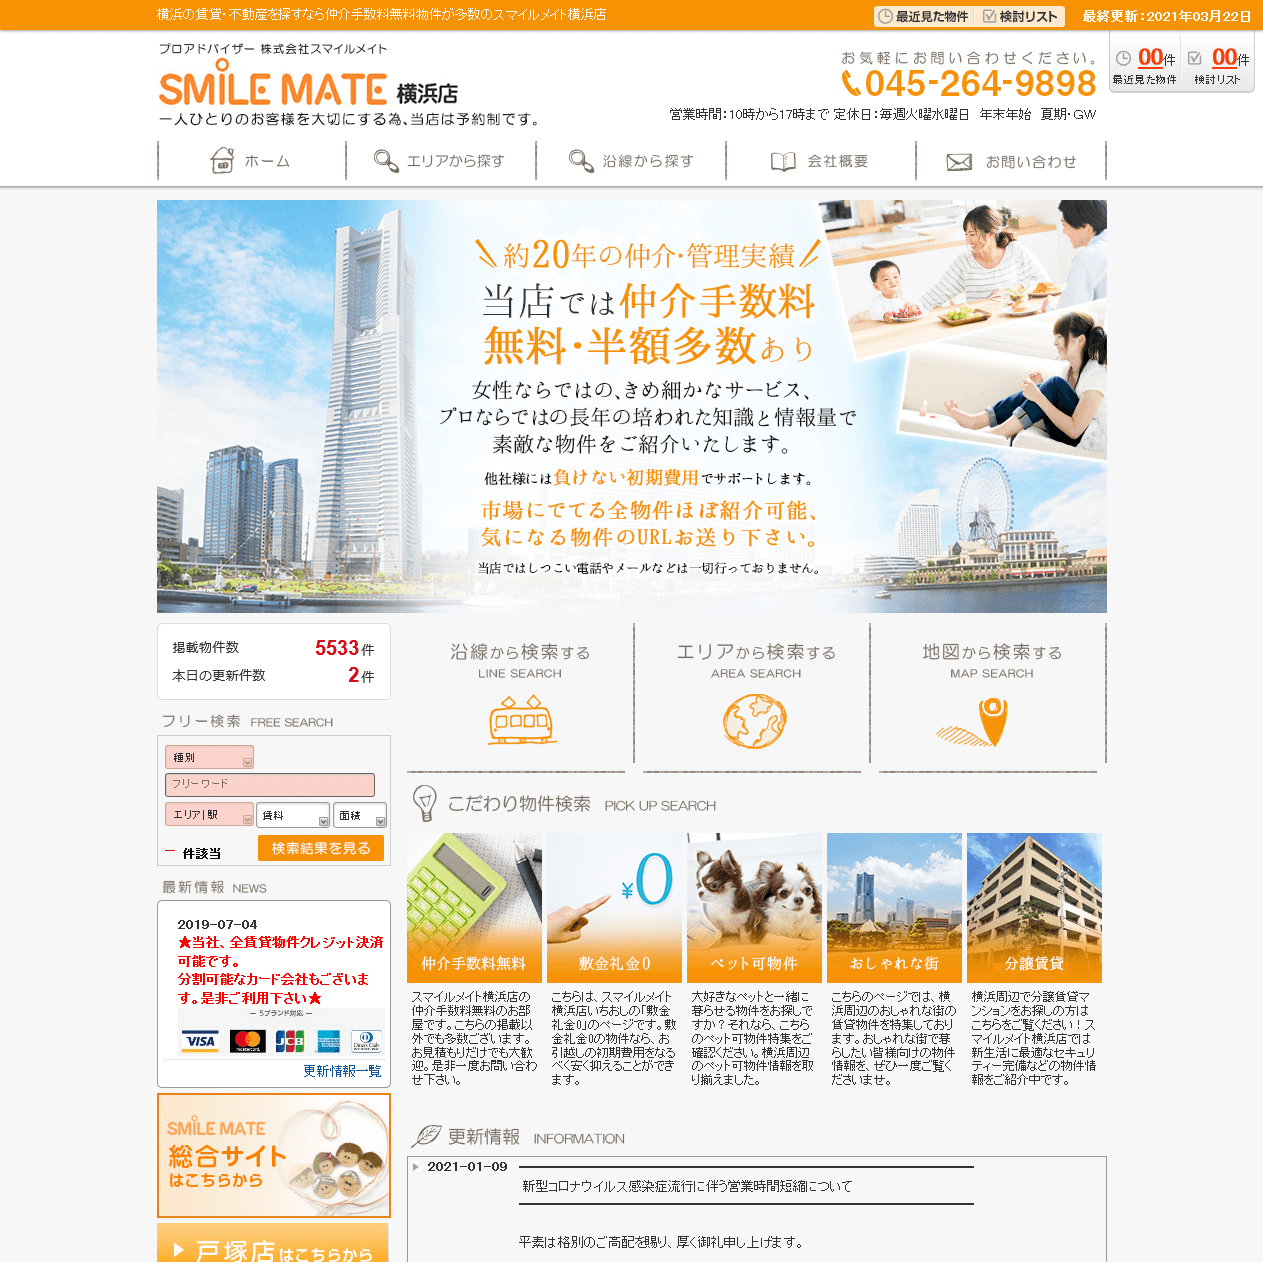 "<span class=""title"">スマイルメイト横浜店</span>"